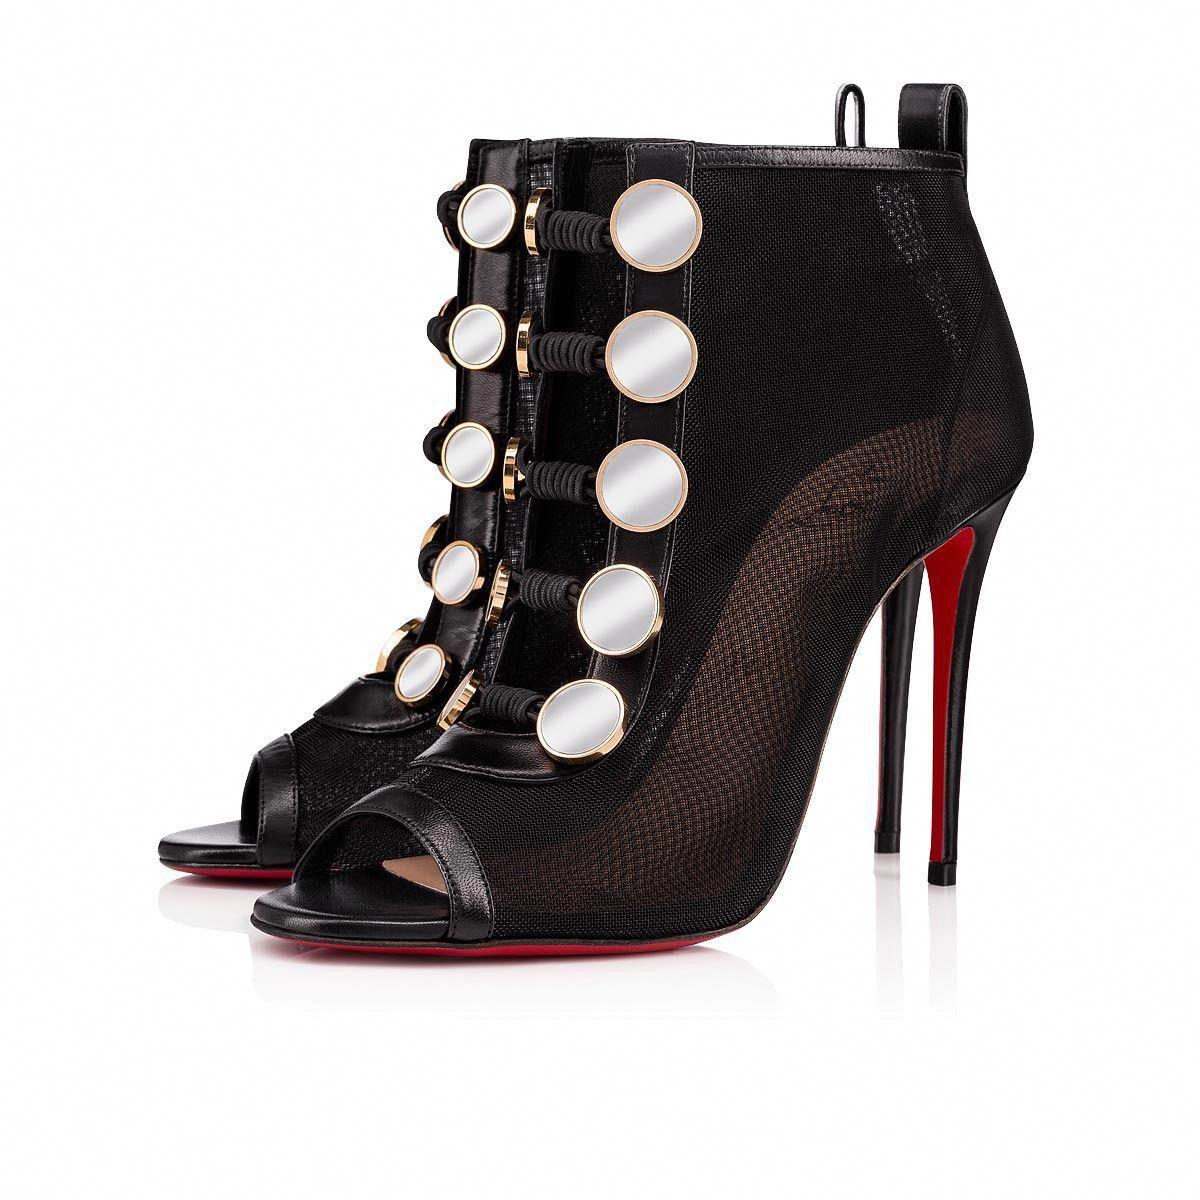 f1c3fd8ff95 Marikate 100 Version Black Leather - Women Shoes - Christian ...